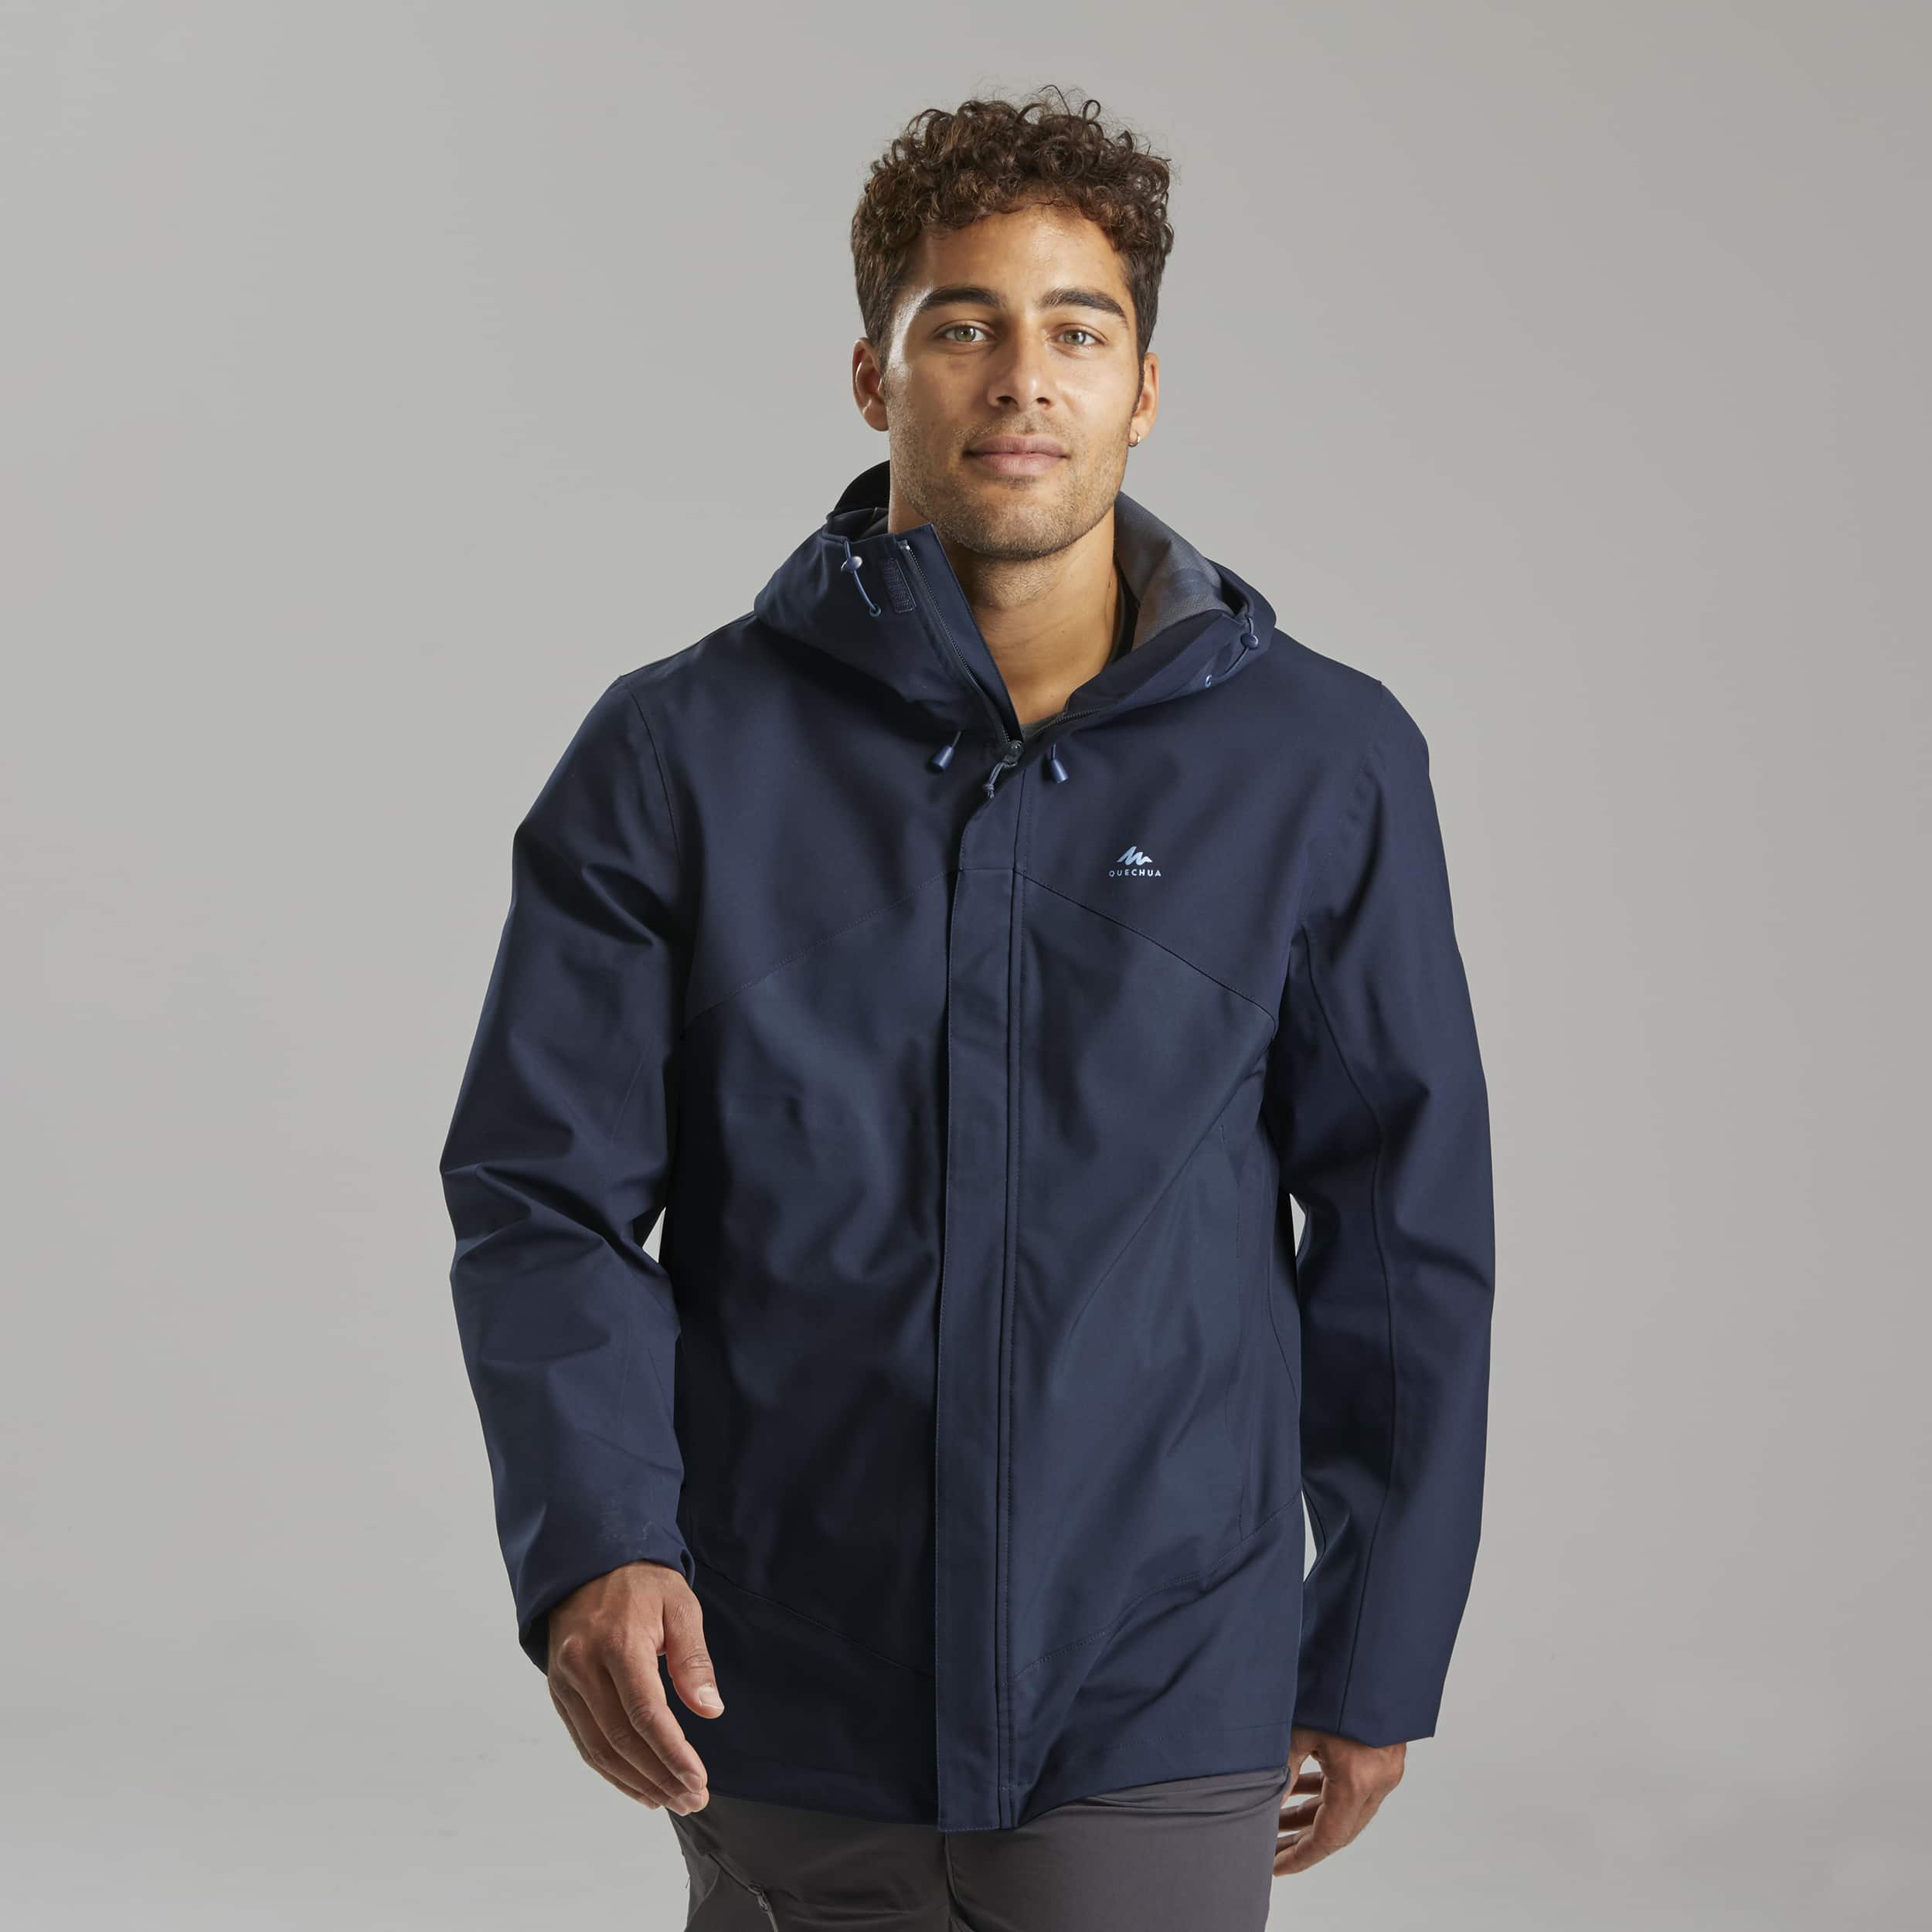 10 Best Winter Jackets For Men - Buyer's Guide